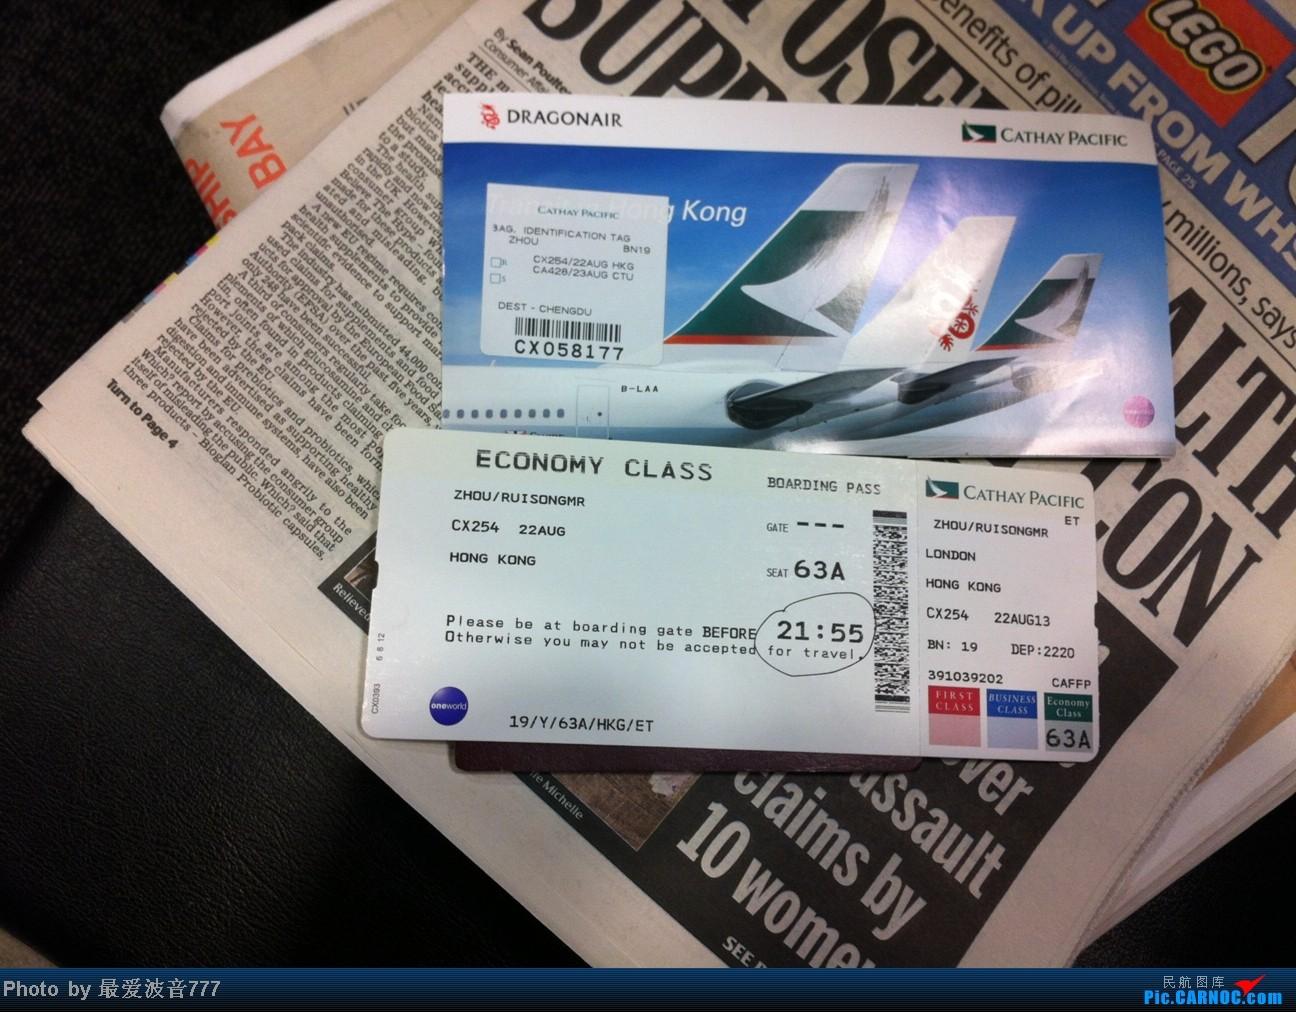 Re:[原创]假期的回国往返之旅 LHR-HKG-CTU-HKG-LHR, CX+CA+KA联合游记    英国伦敦希思罗机场